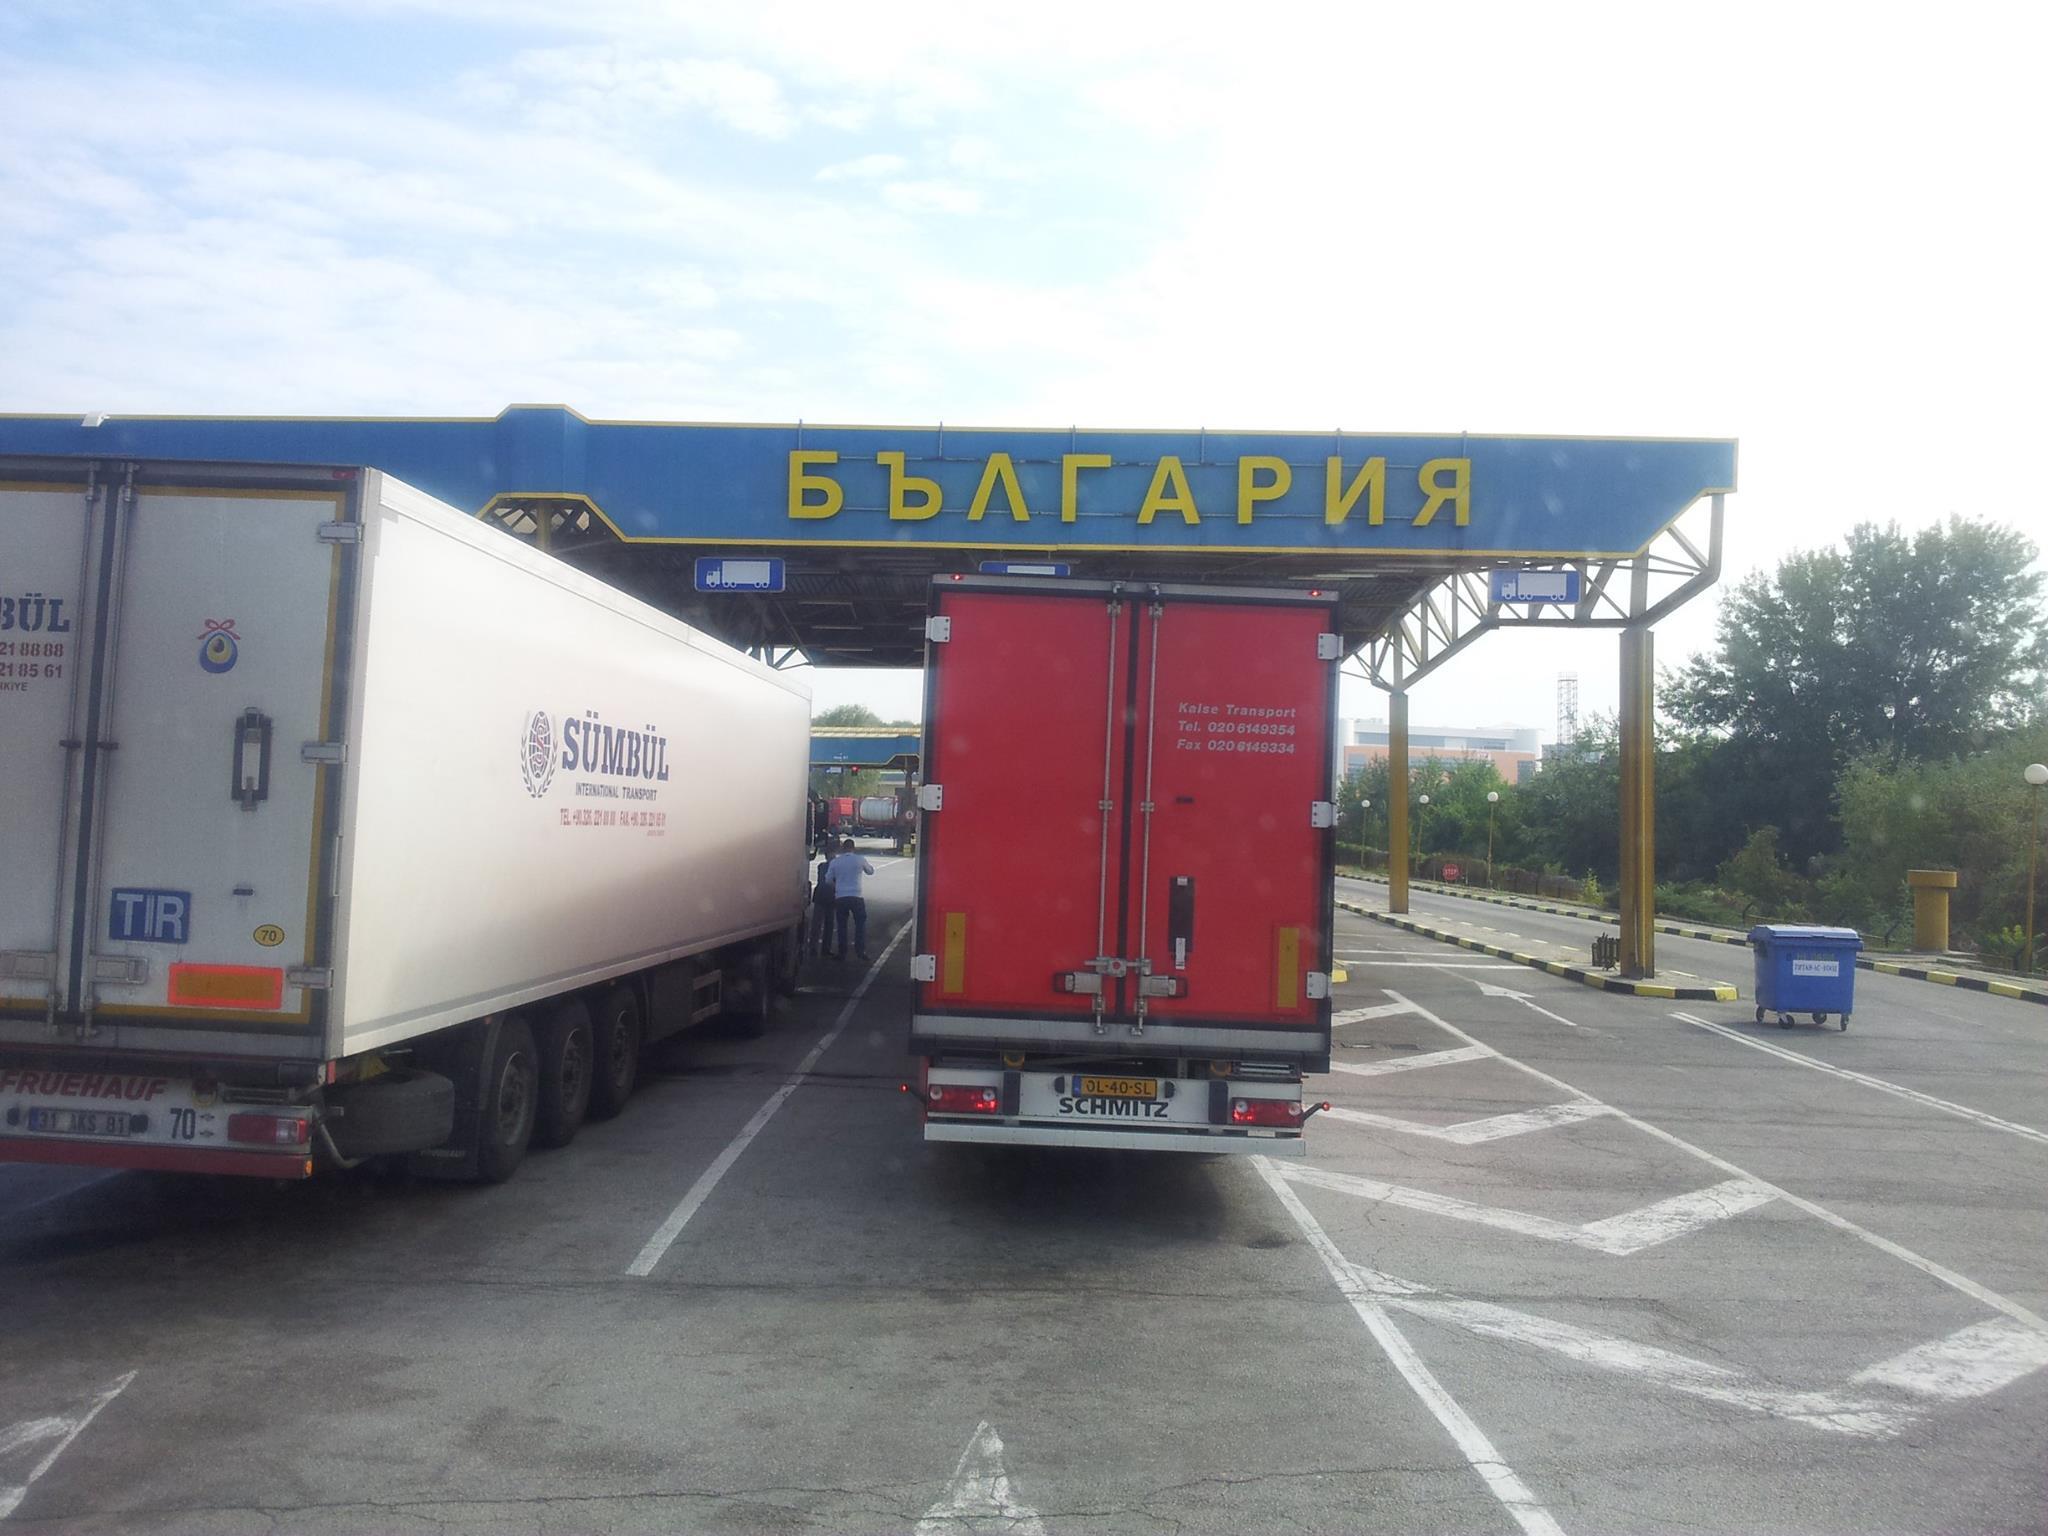 Michael-Bavelaar-Bulgaria--2013